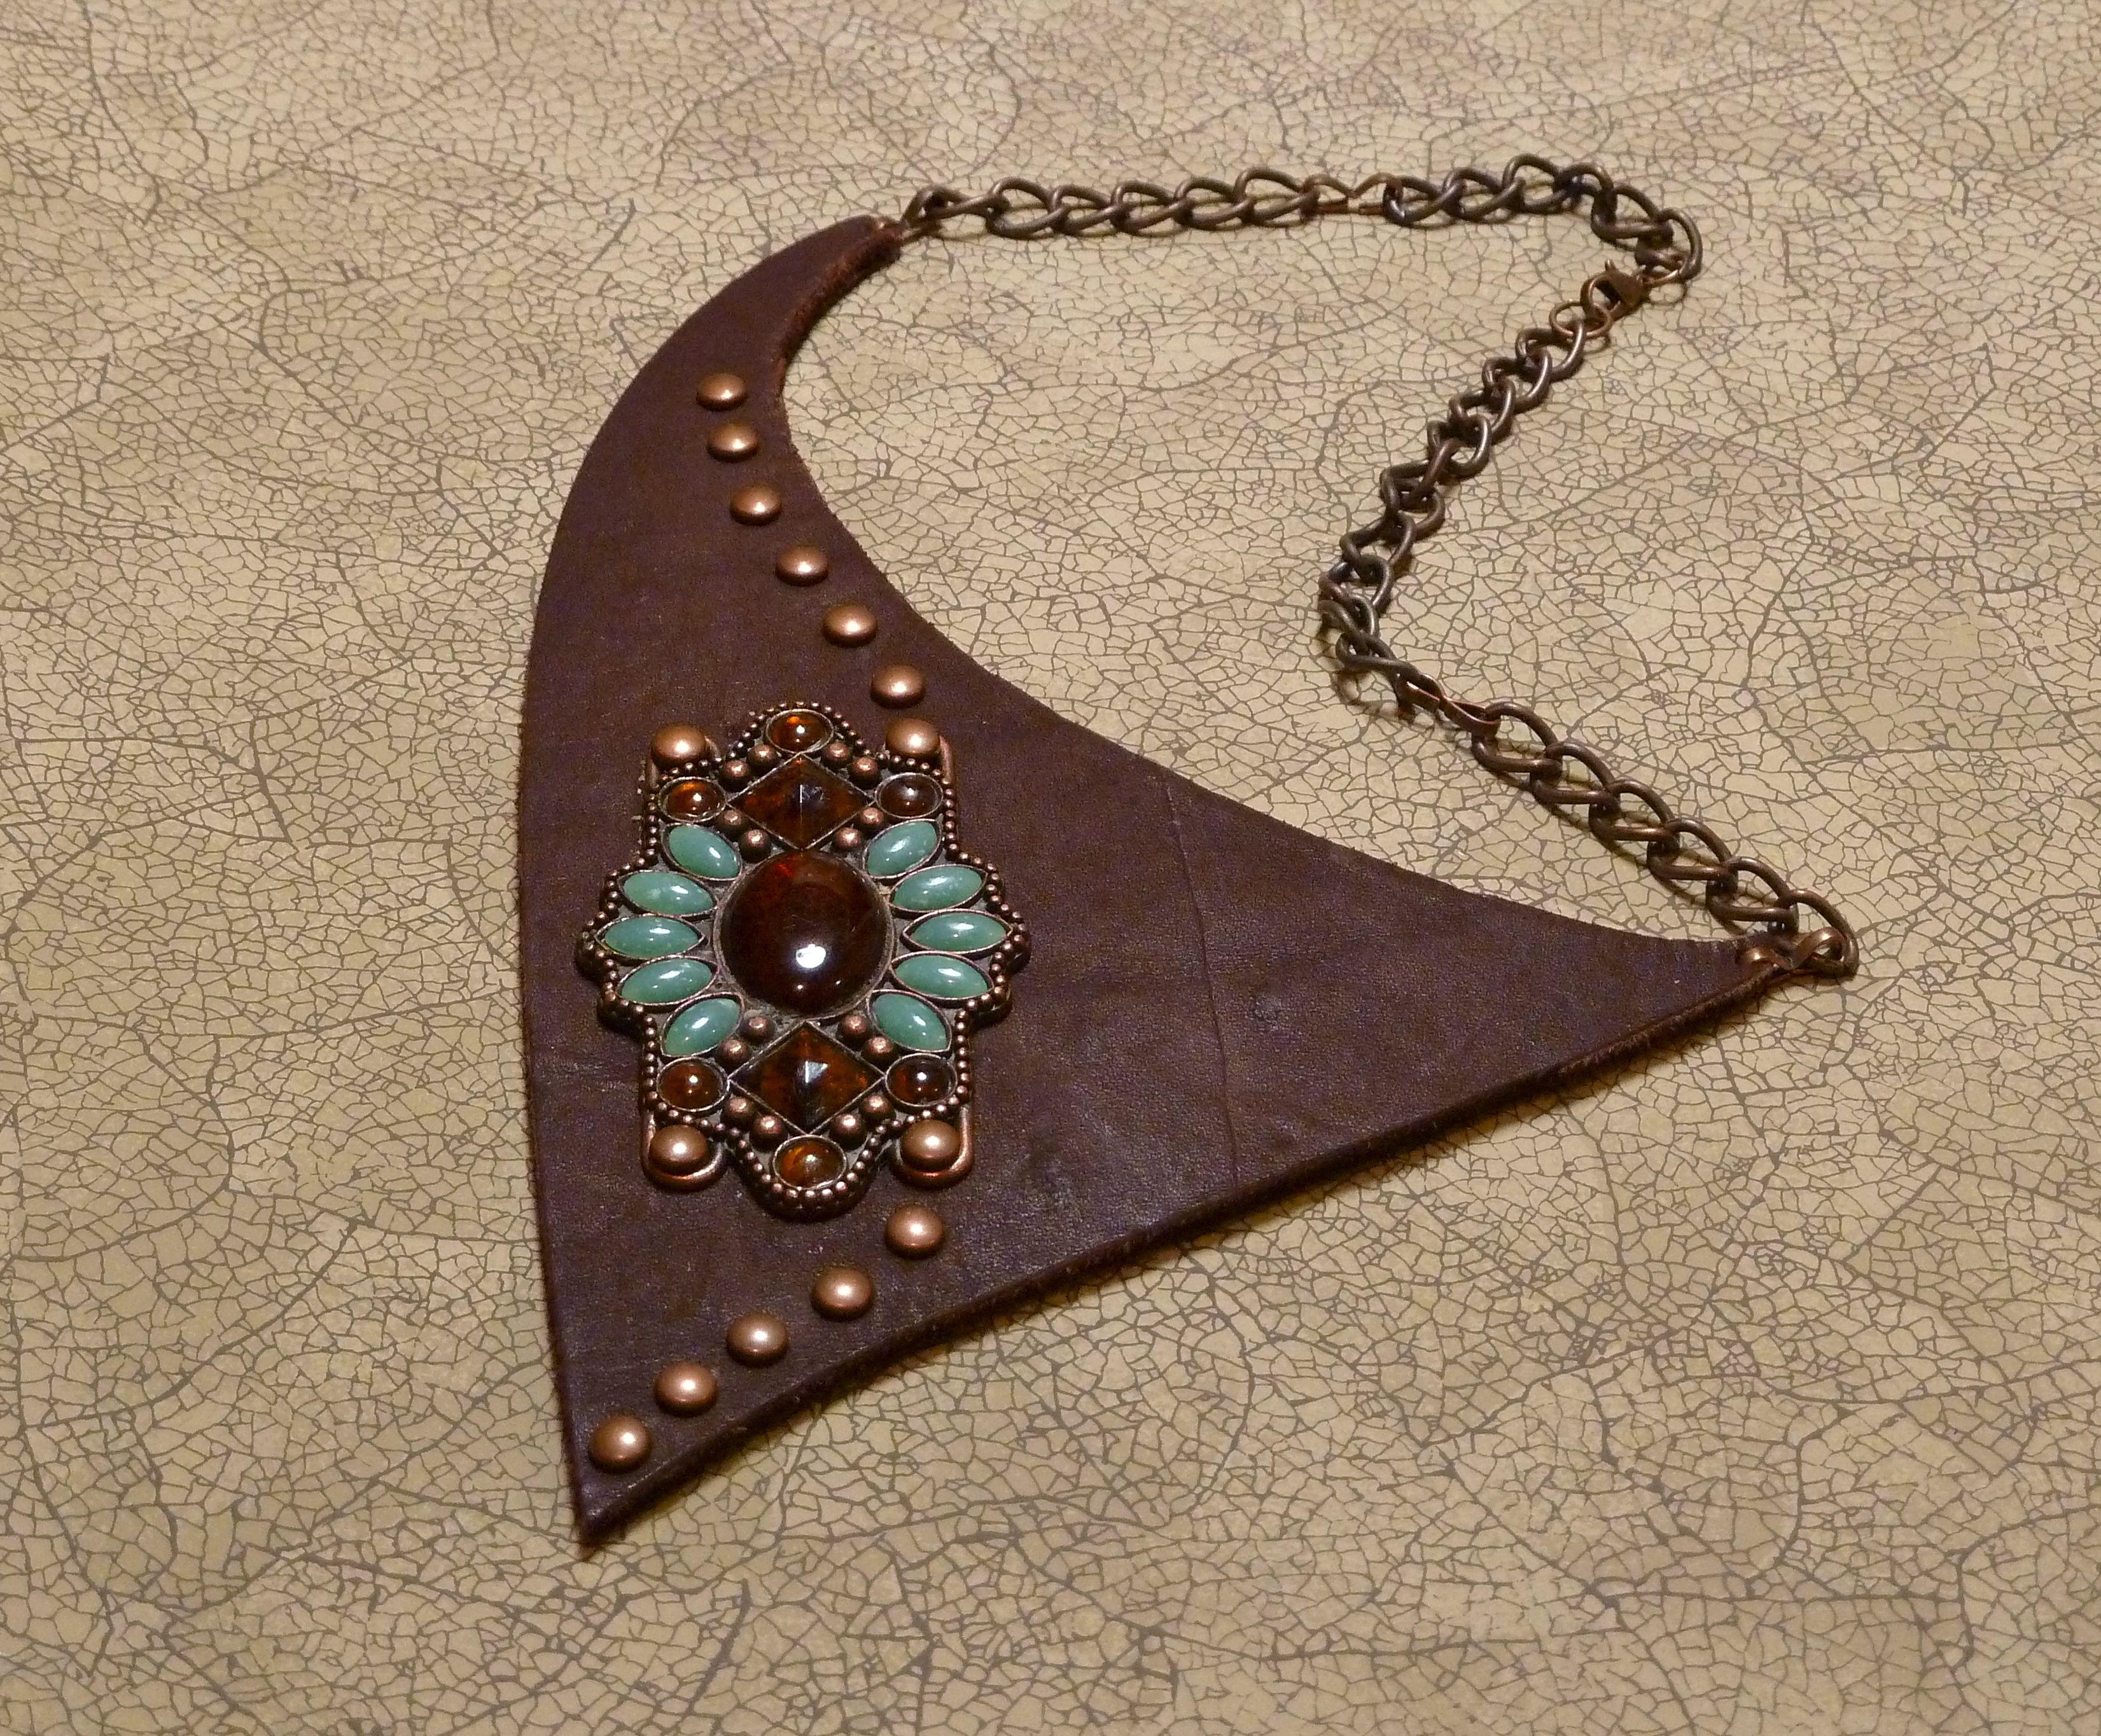 Leather Craft Ideas Rl Scrap Leather Metal Belt Segment Brads